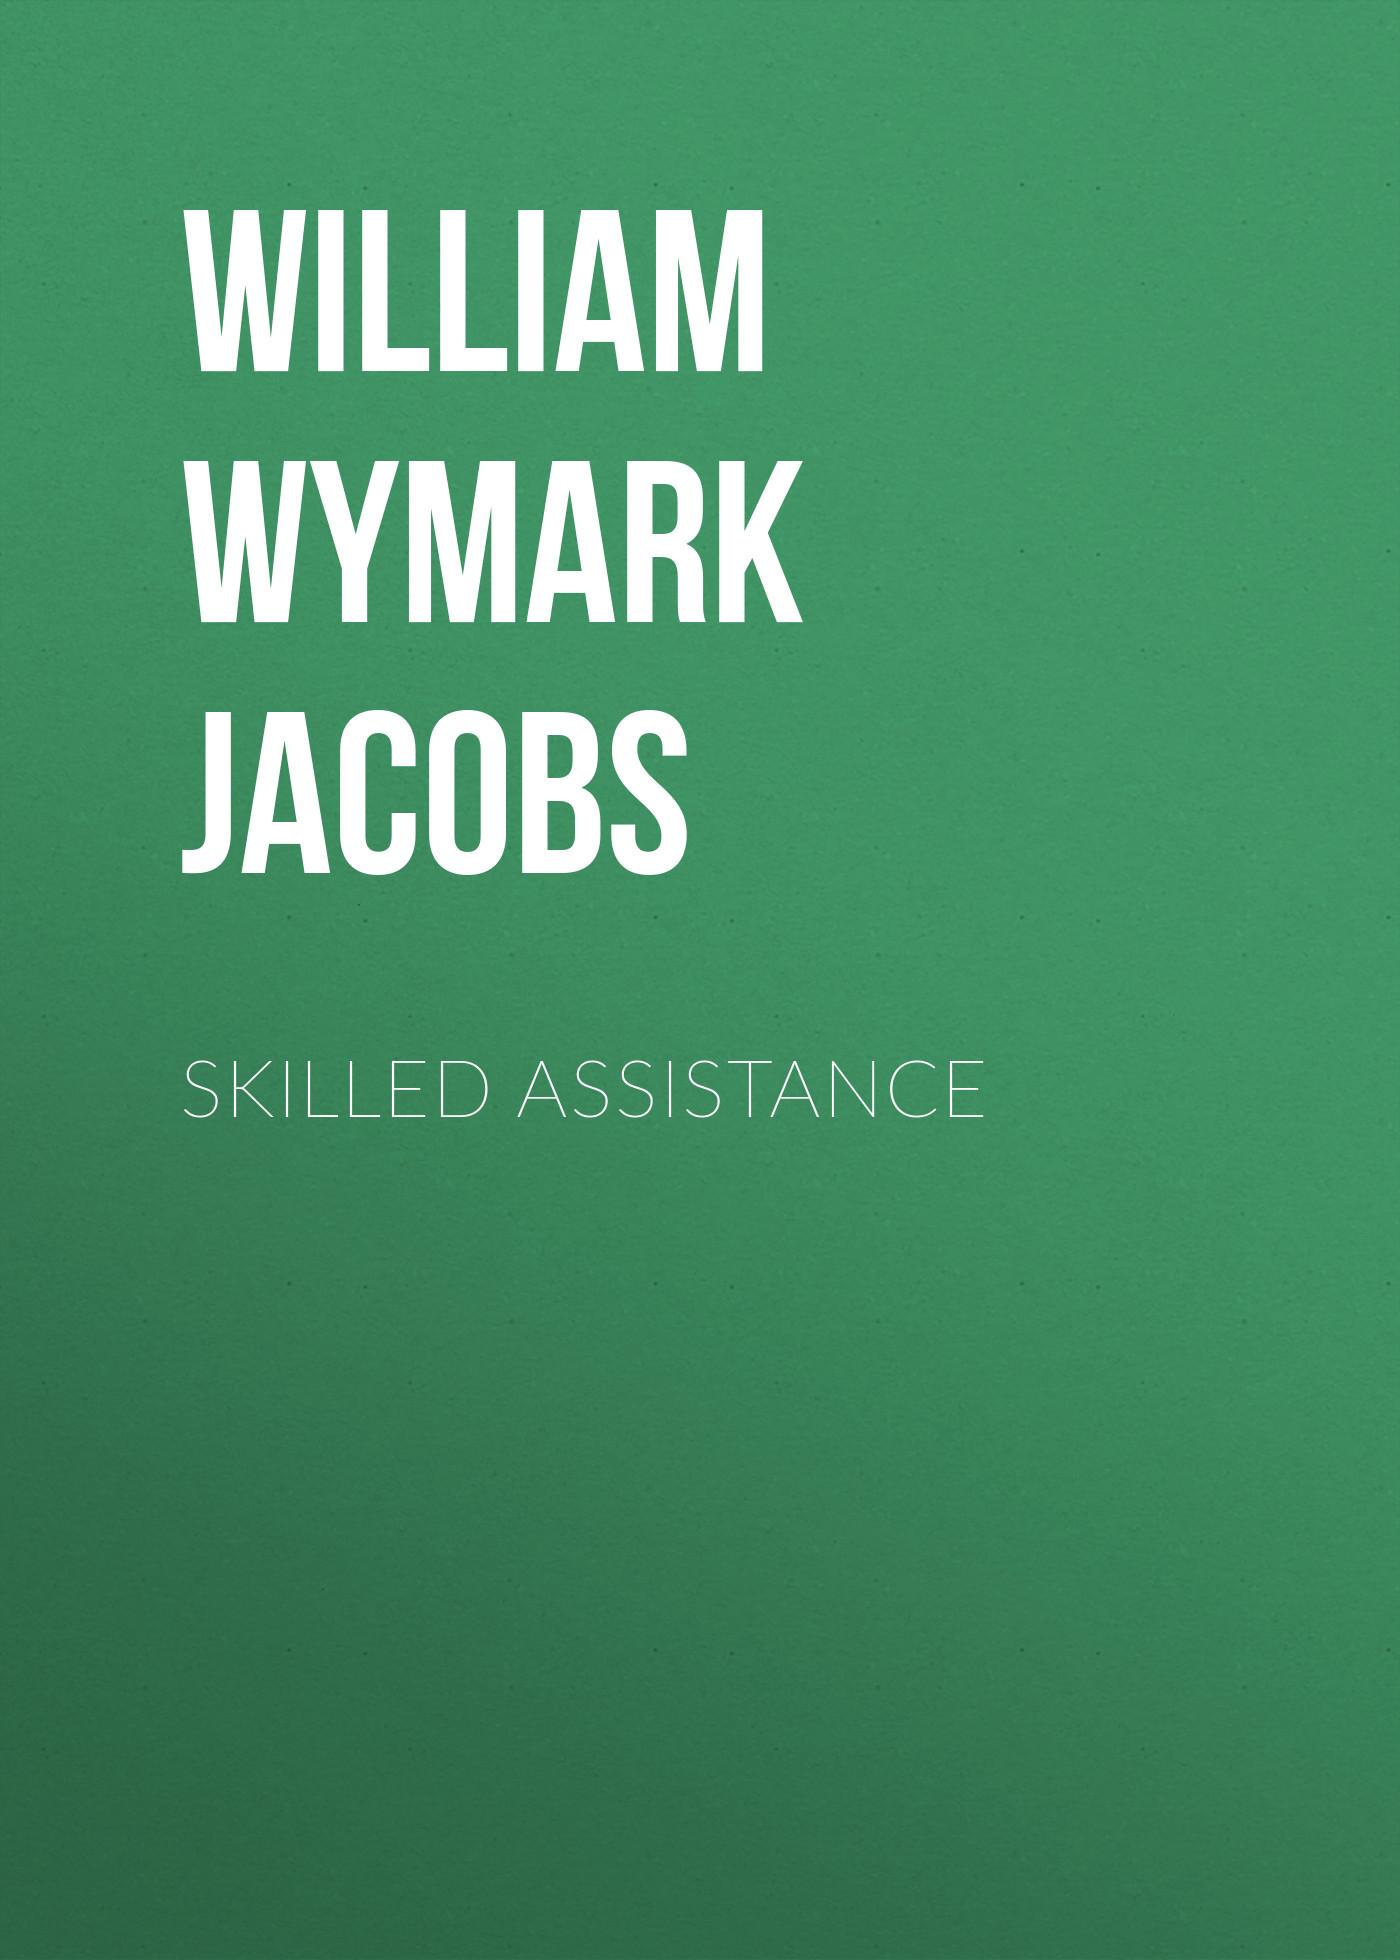 Skilled Assistance